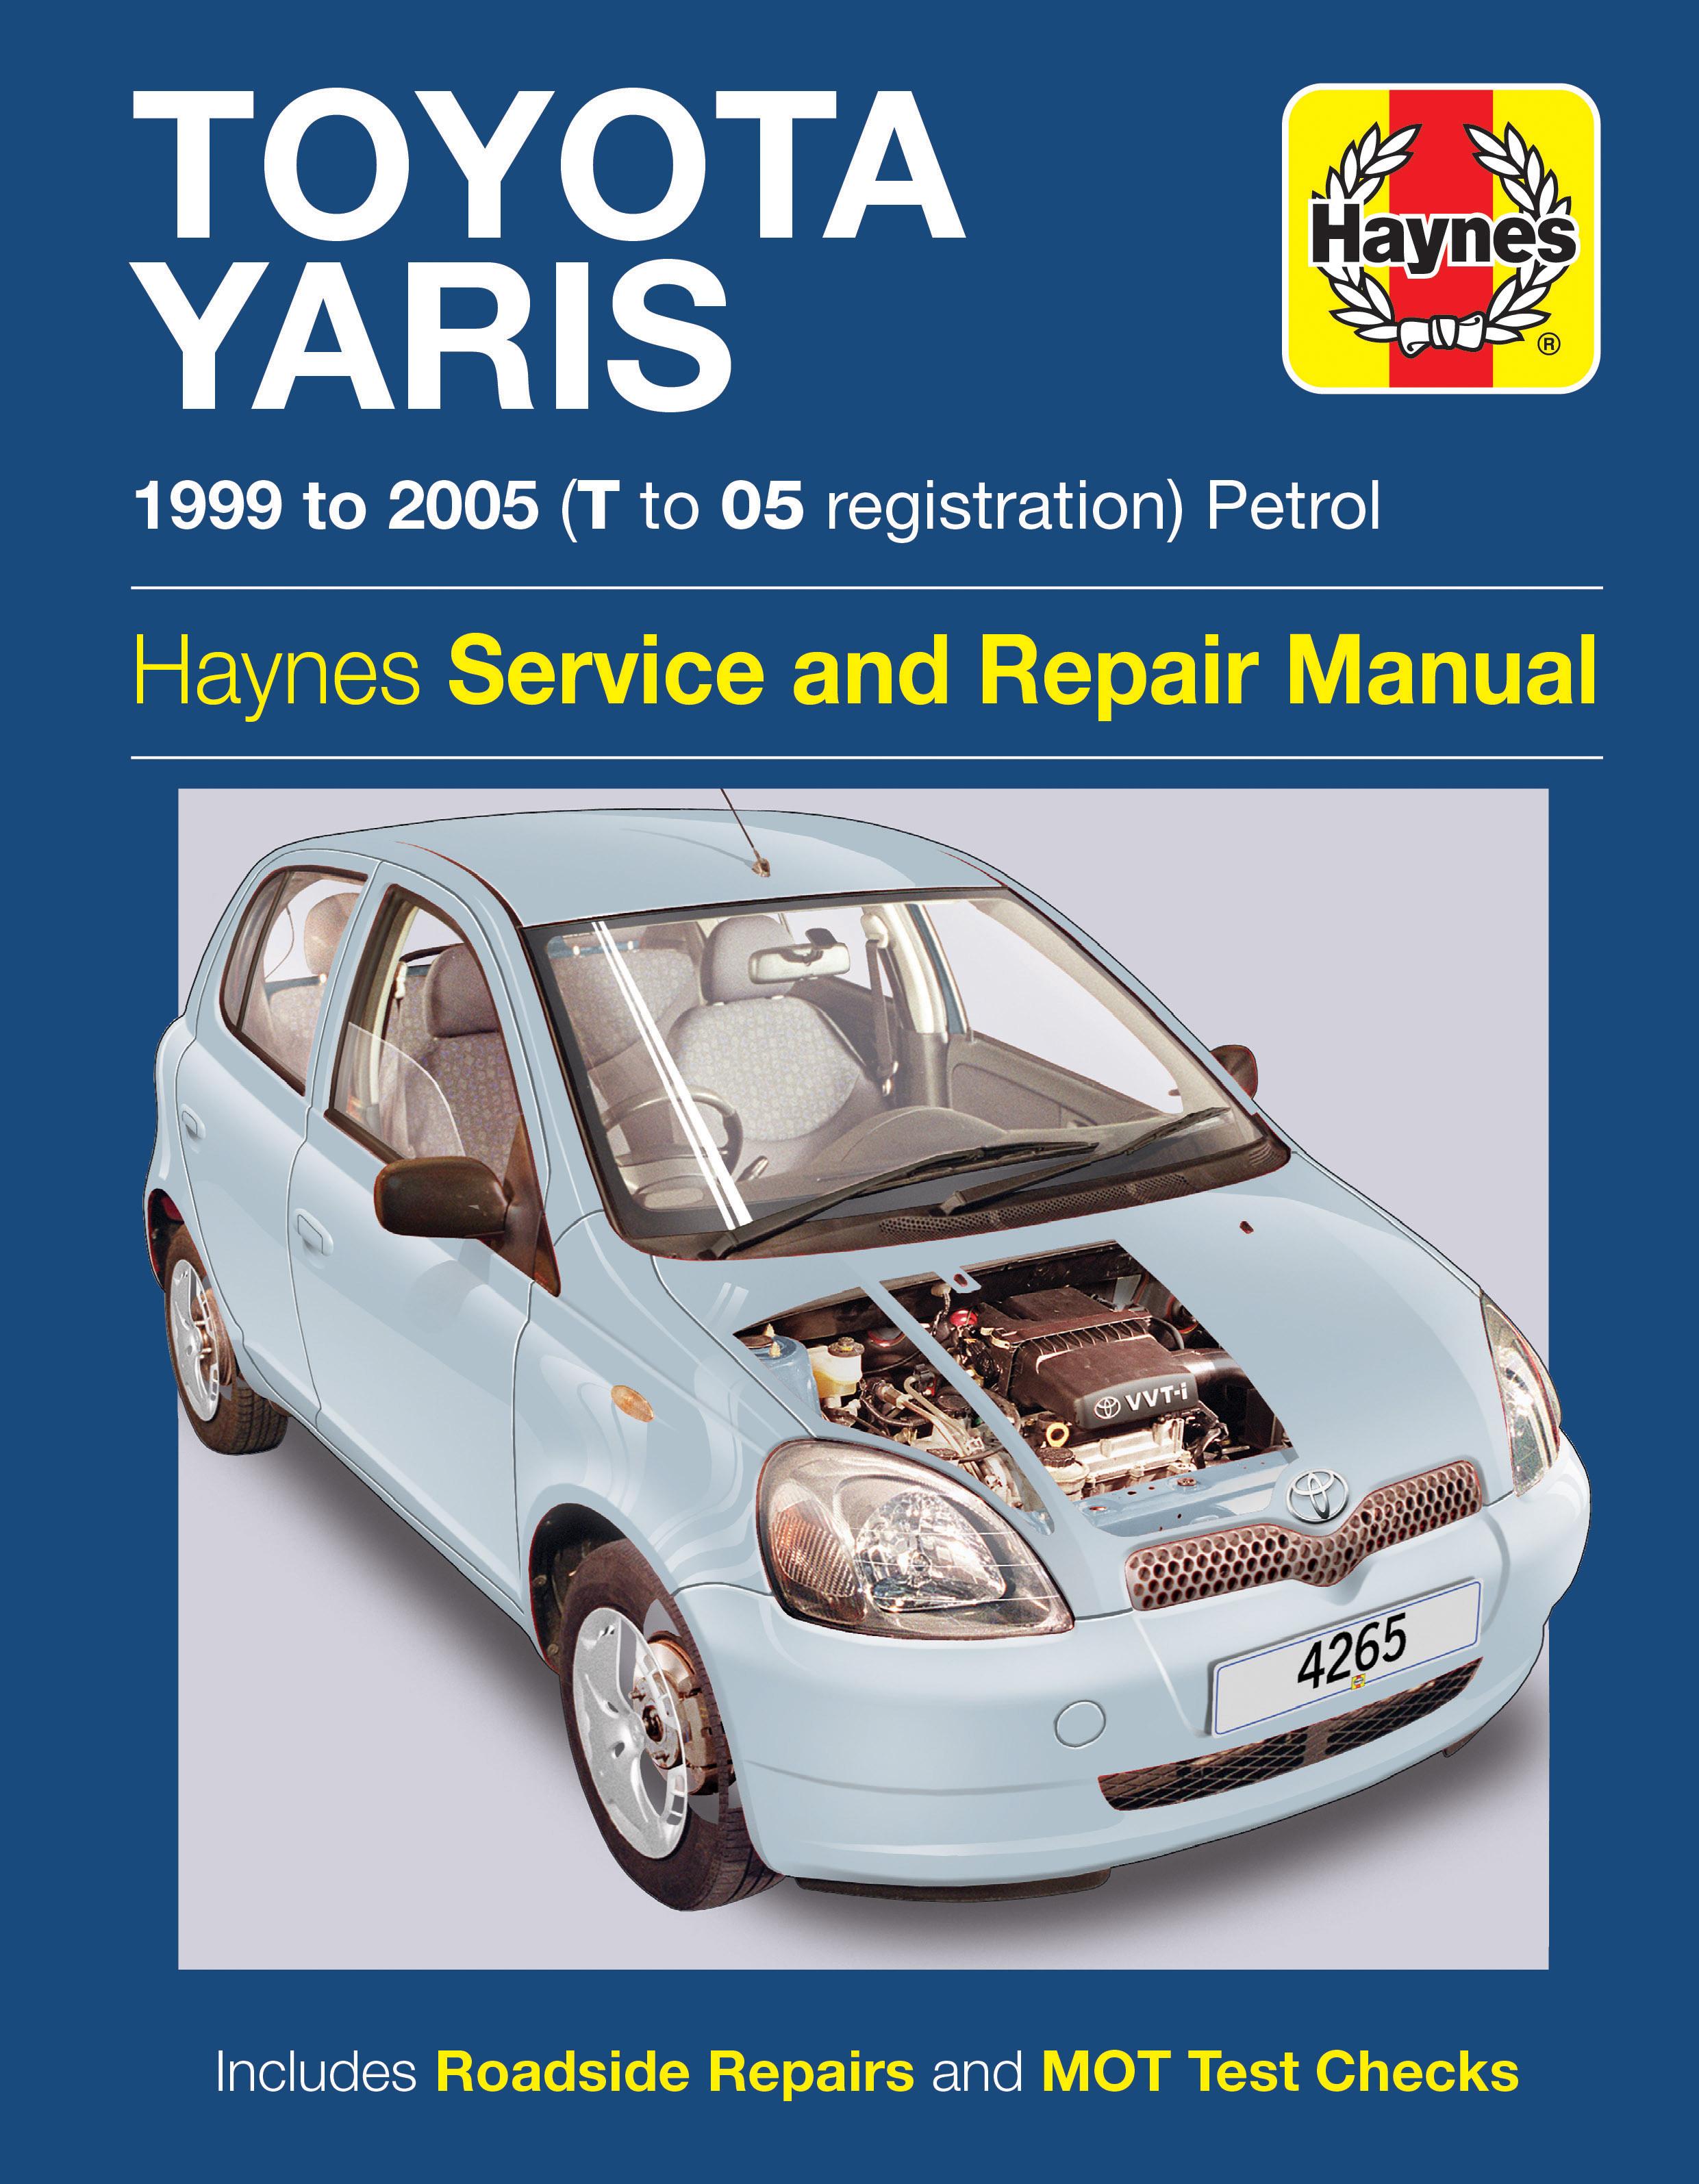 2009 Toyota Yaris Wiring Diagram Pdf    Eightstrings Blogspot Com